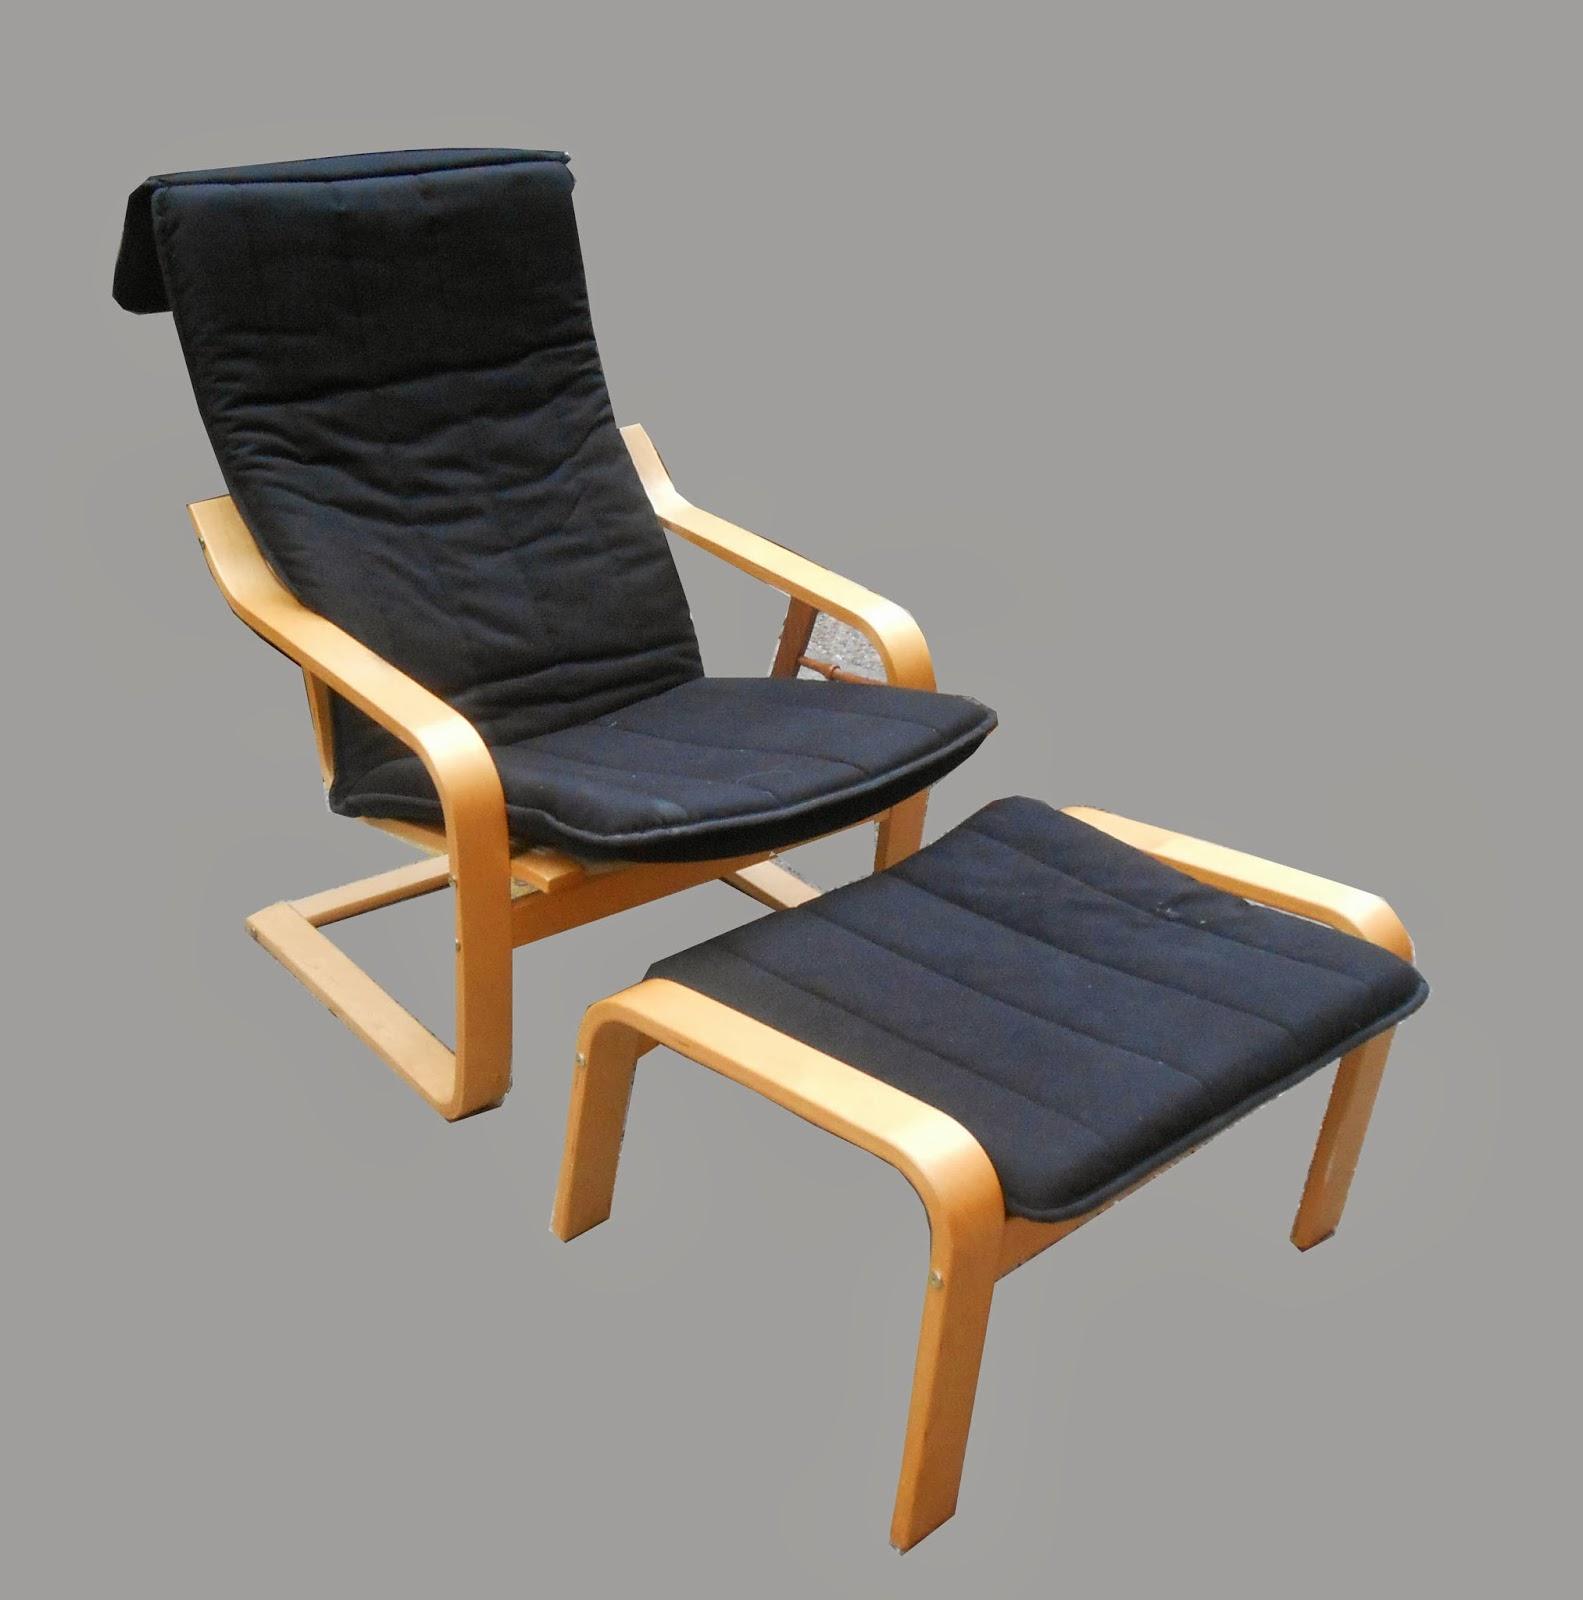 Uhuru Furniture & Collectibles: Ikea Poang Lounge Chair ...